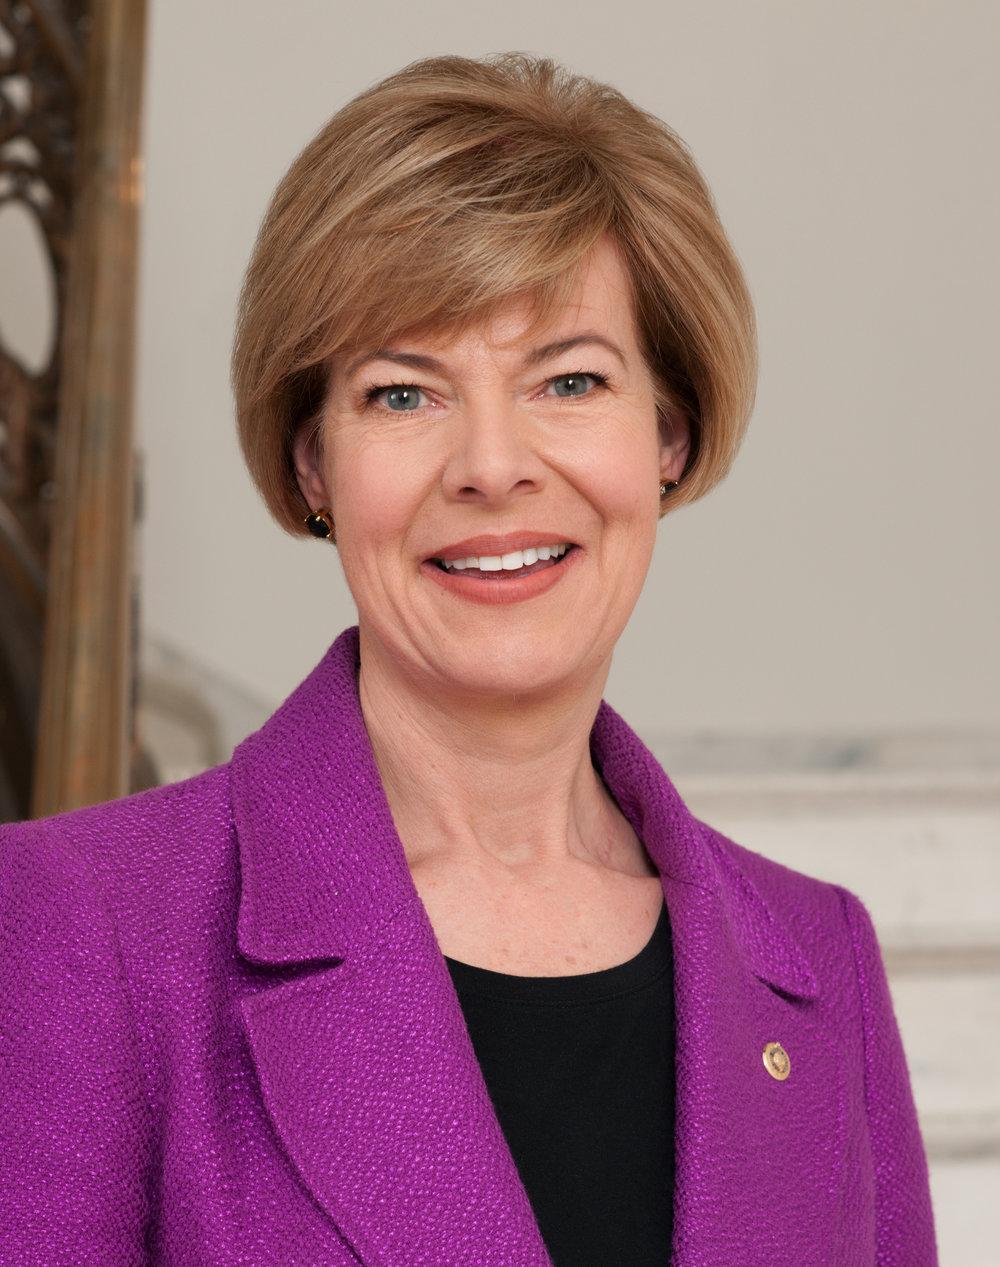 Sen. Tammy Baldwin (D-WI)